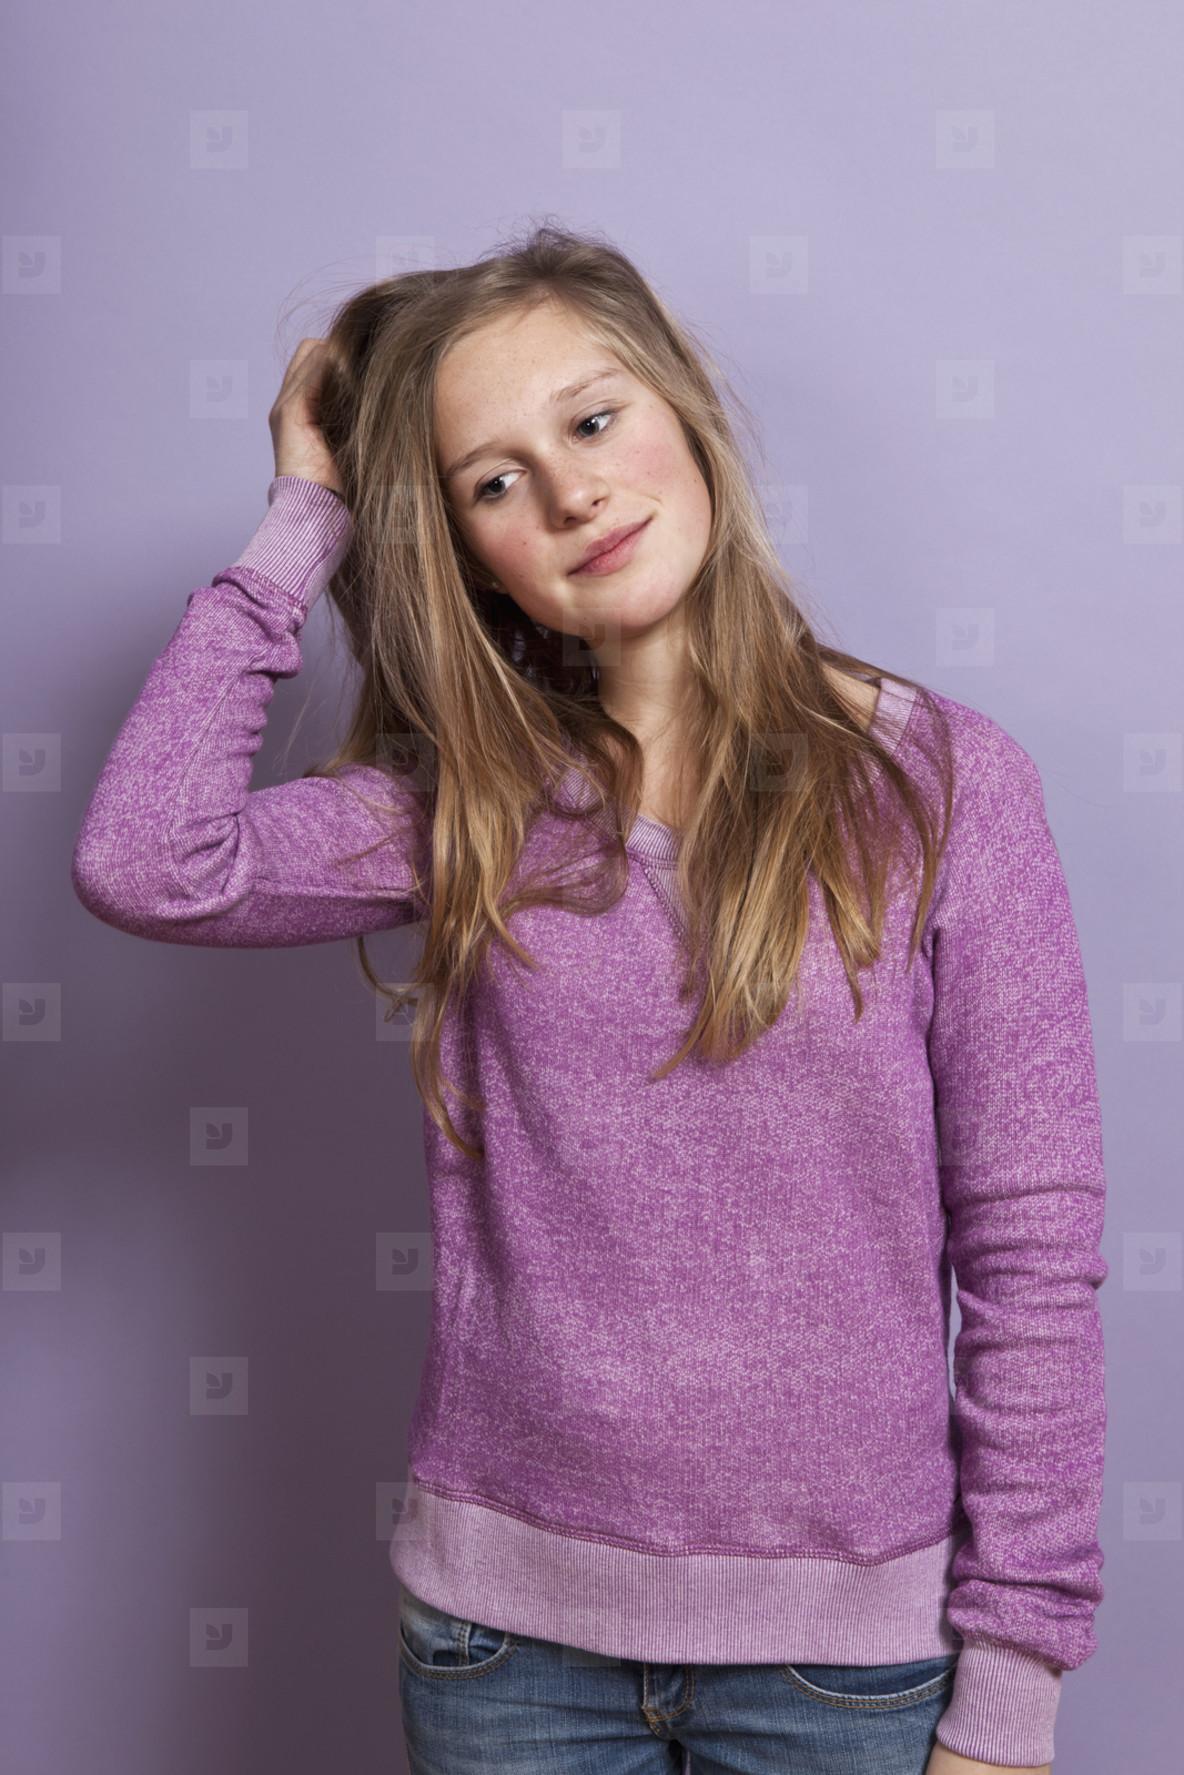 Teen Portraits  13